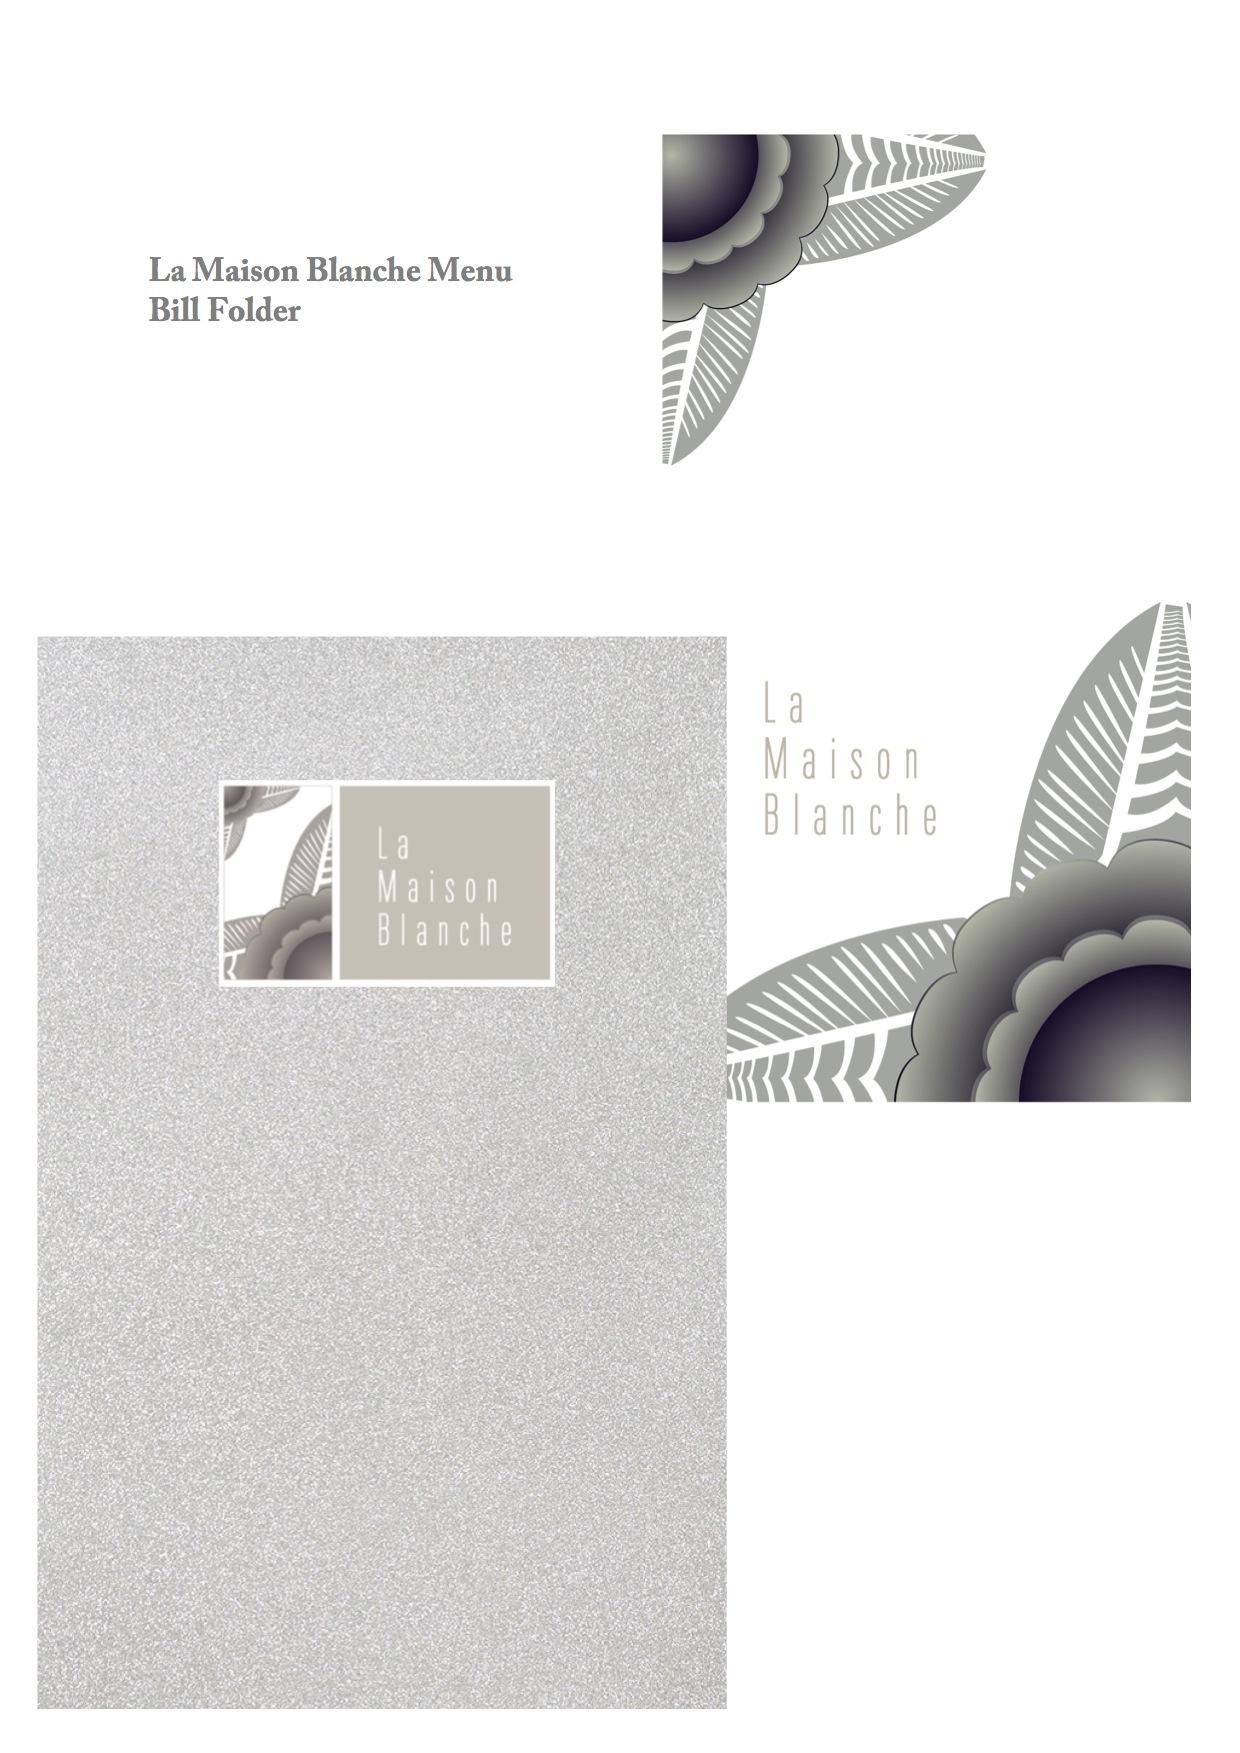 La Maison Blanche Branding 2